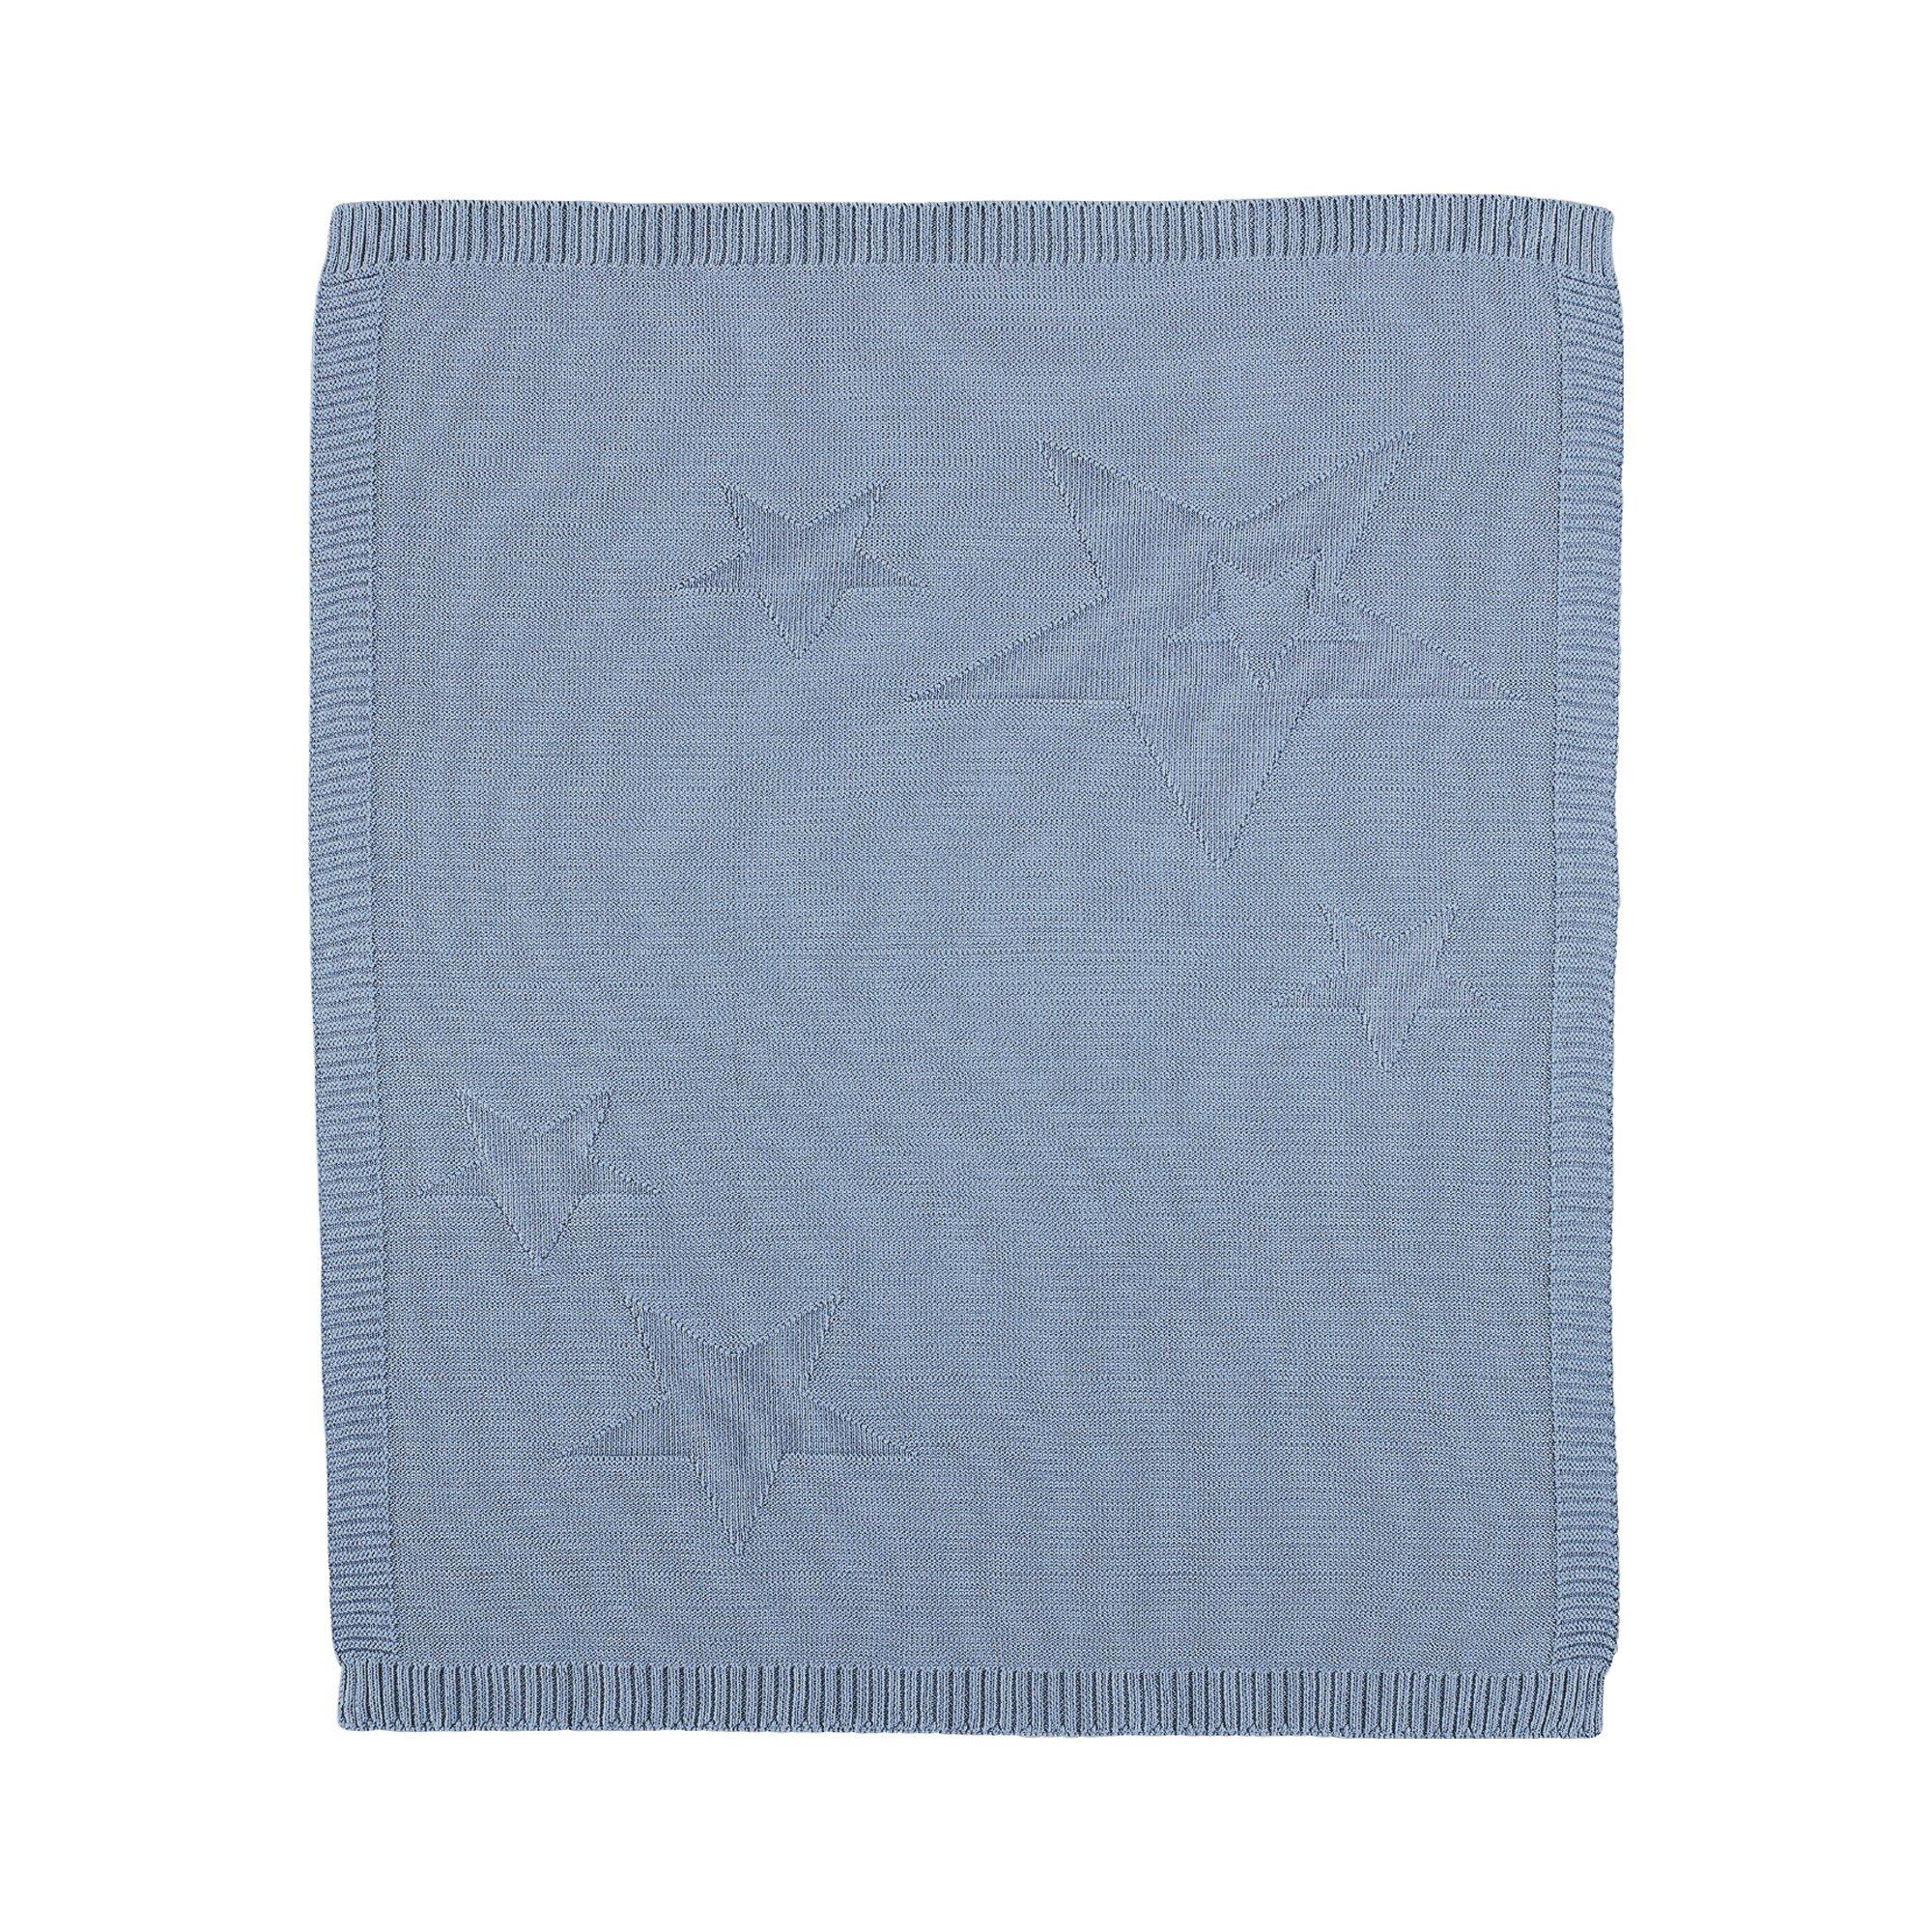 sterntaler-strick-babydecke-baylee-90x75-cm-blau